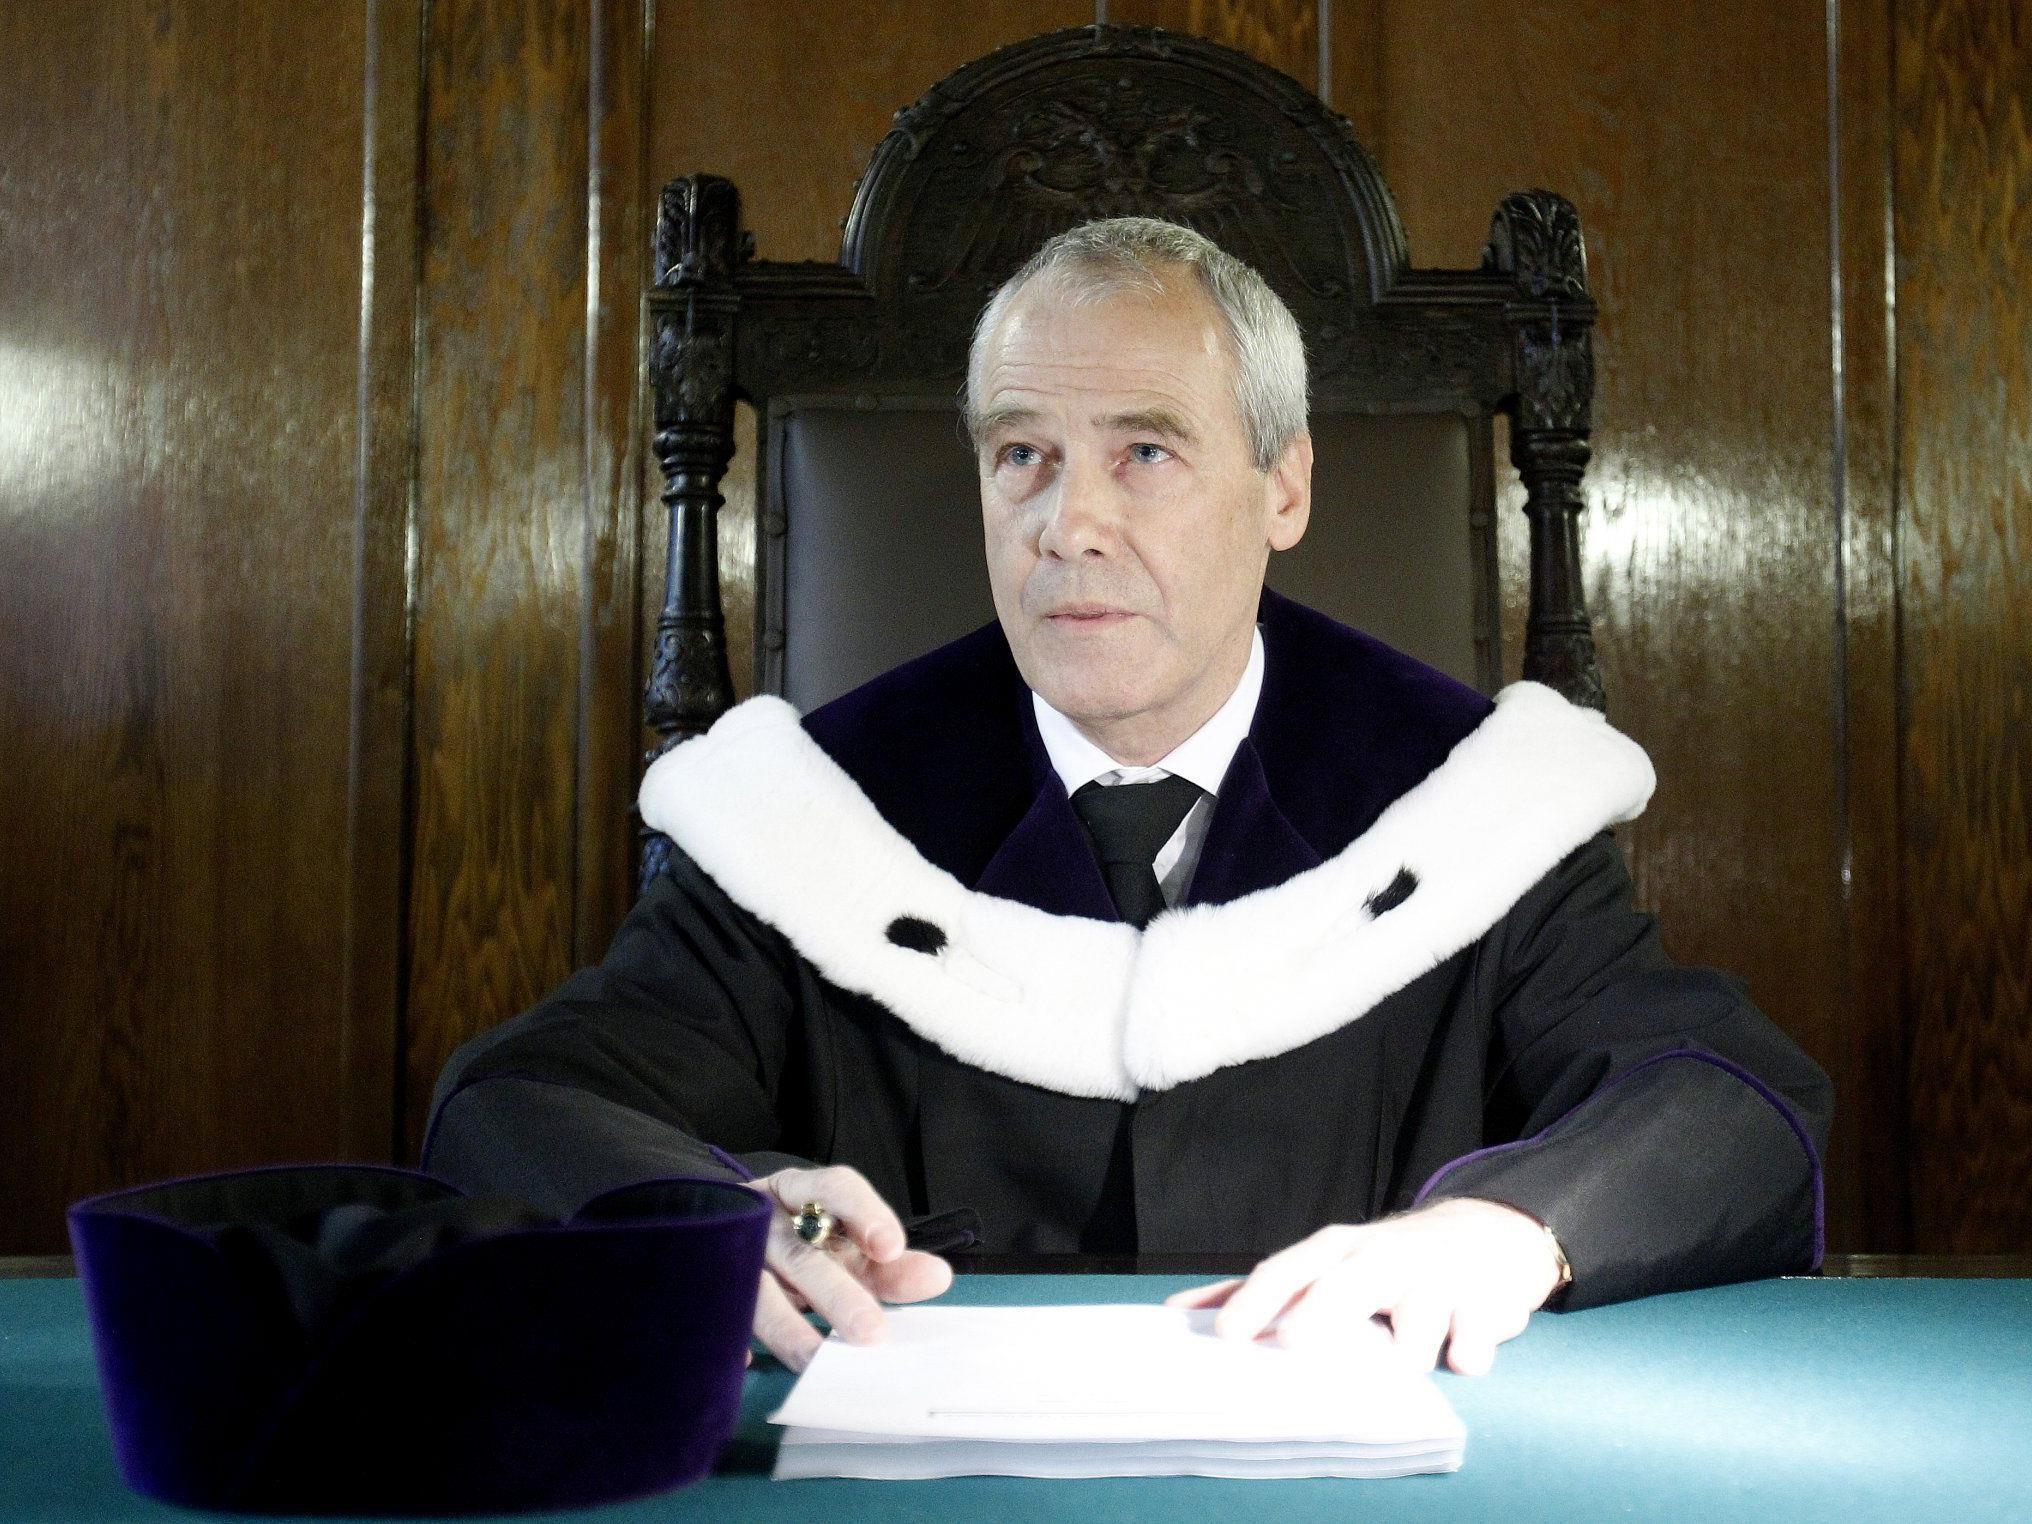 Verhandlungsvorsitzende Eckart Ratz am Donnerstag, 17. Februar 2011, vor der Berufungsverhandlung am OGH zum Fall Herberstein.